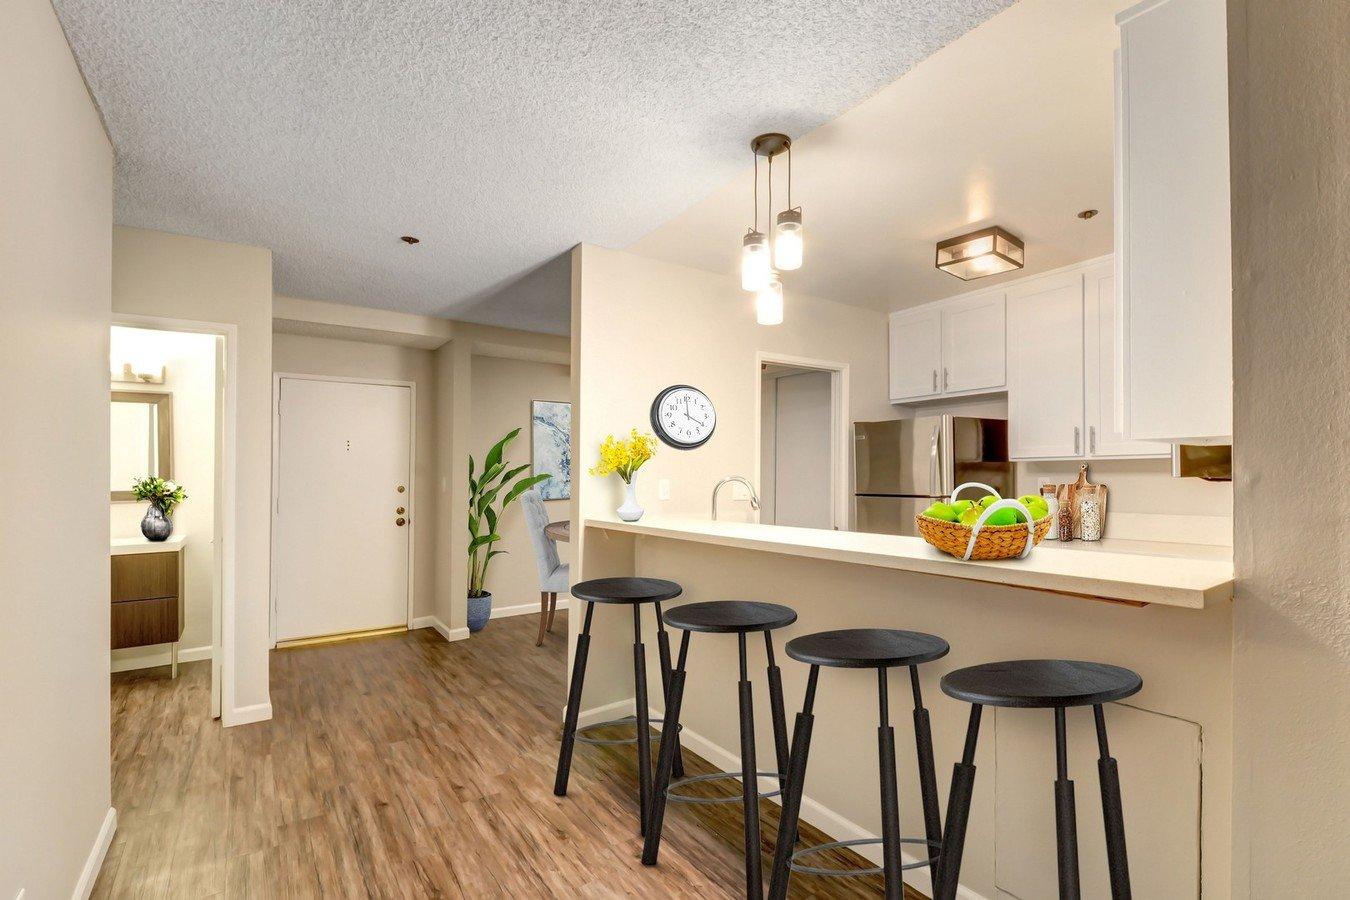 1 Bedroom 1 Bathroom Apartment for rent at Montana Avenue in Santa Monica, CA